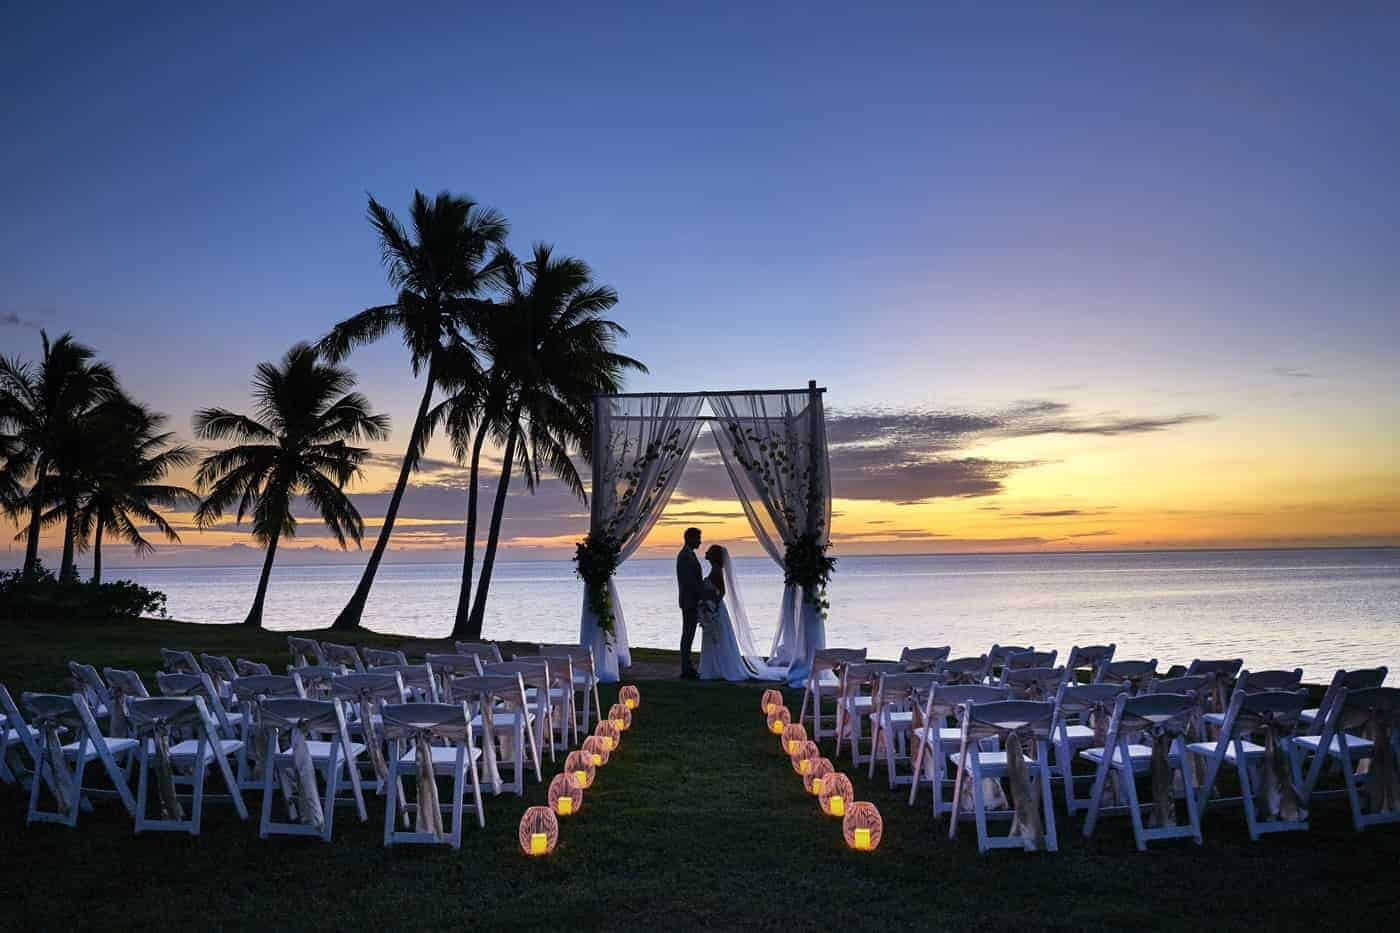 FIji wedding-marriot hotel